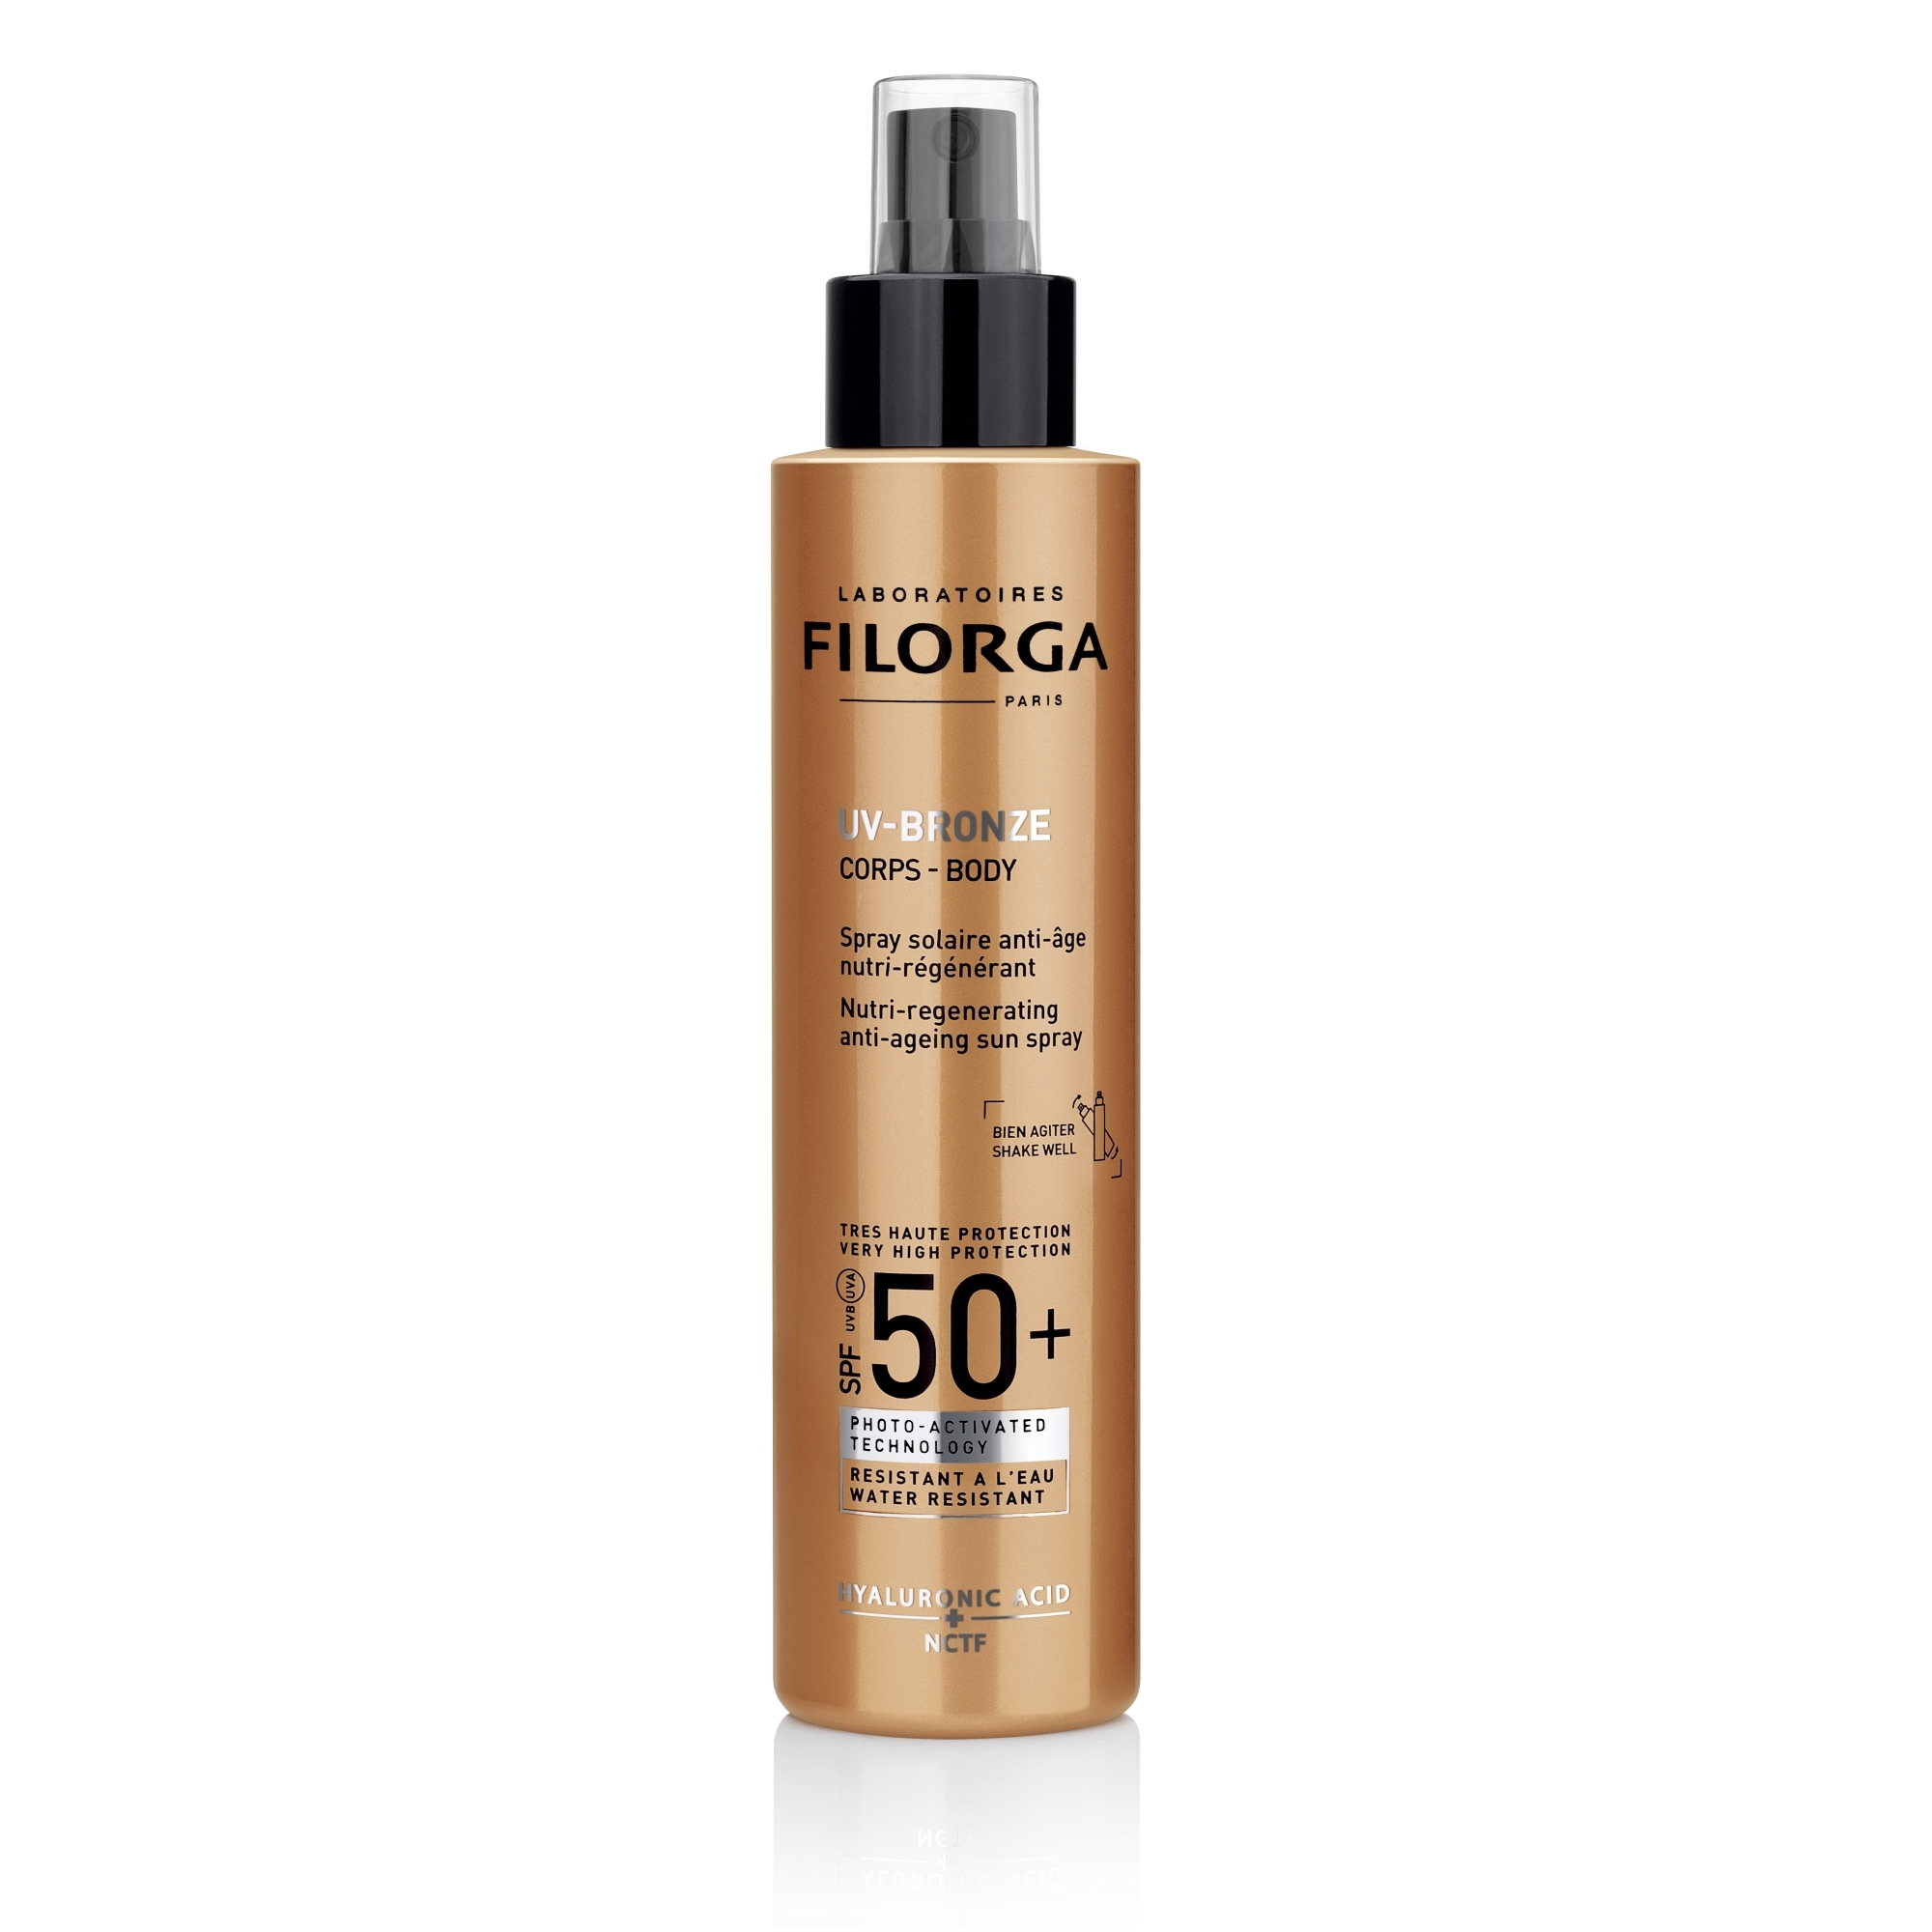 UV Bronze Body SPF 50+